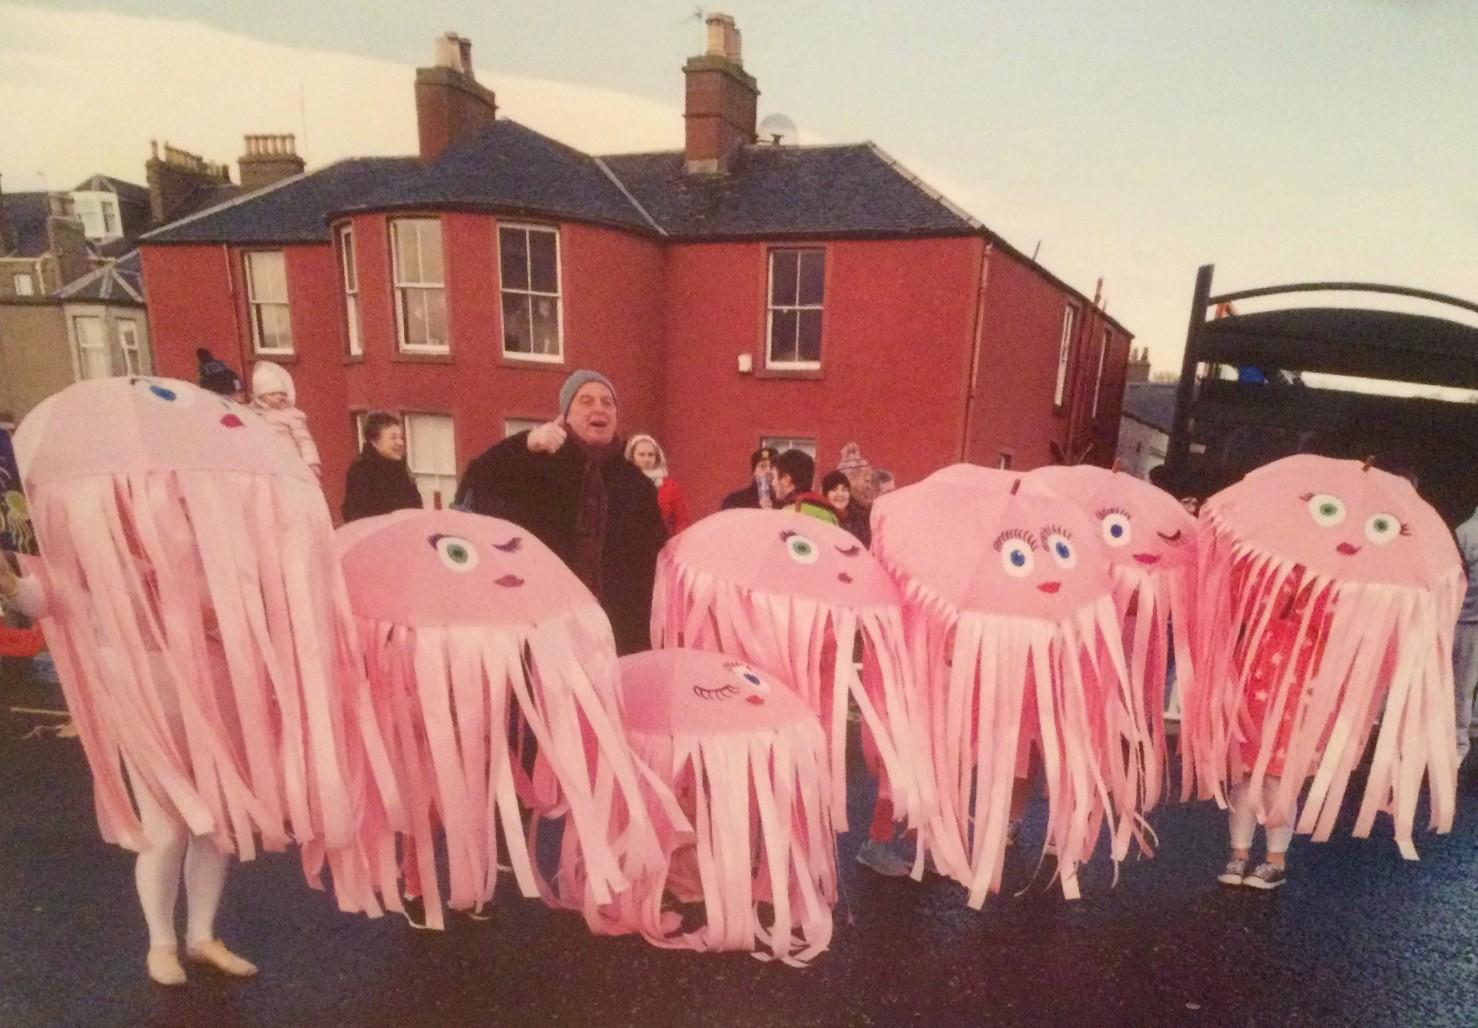 Vivien Scott in Jellyfish Costume